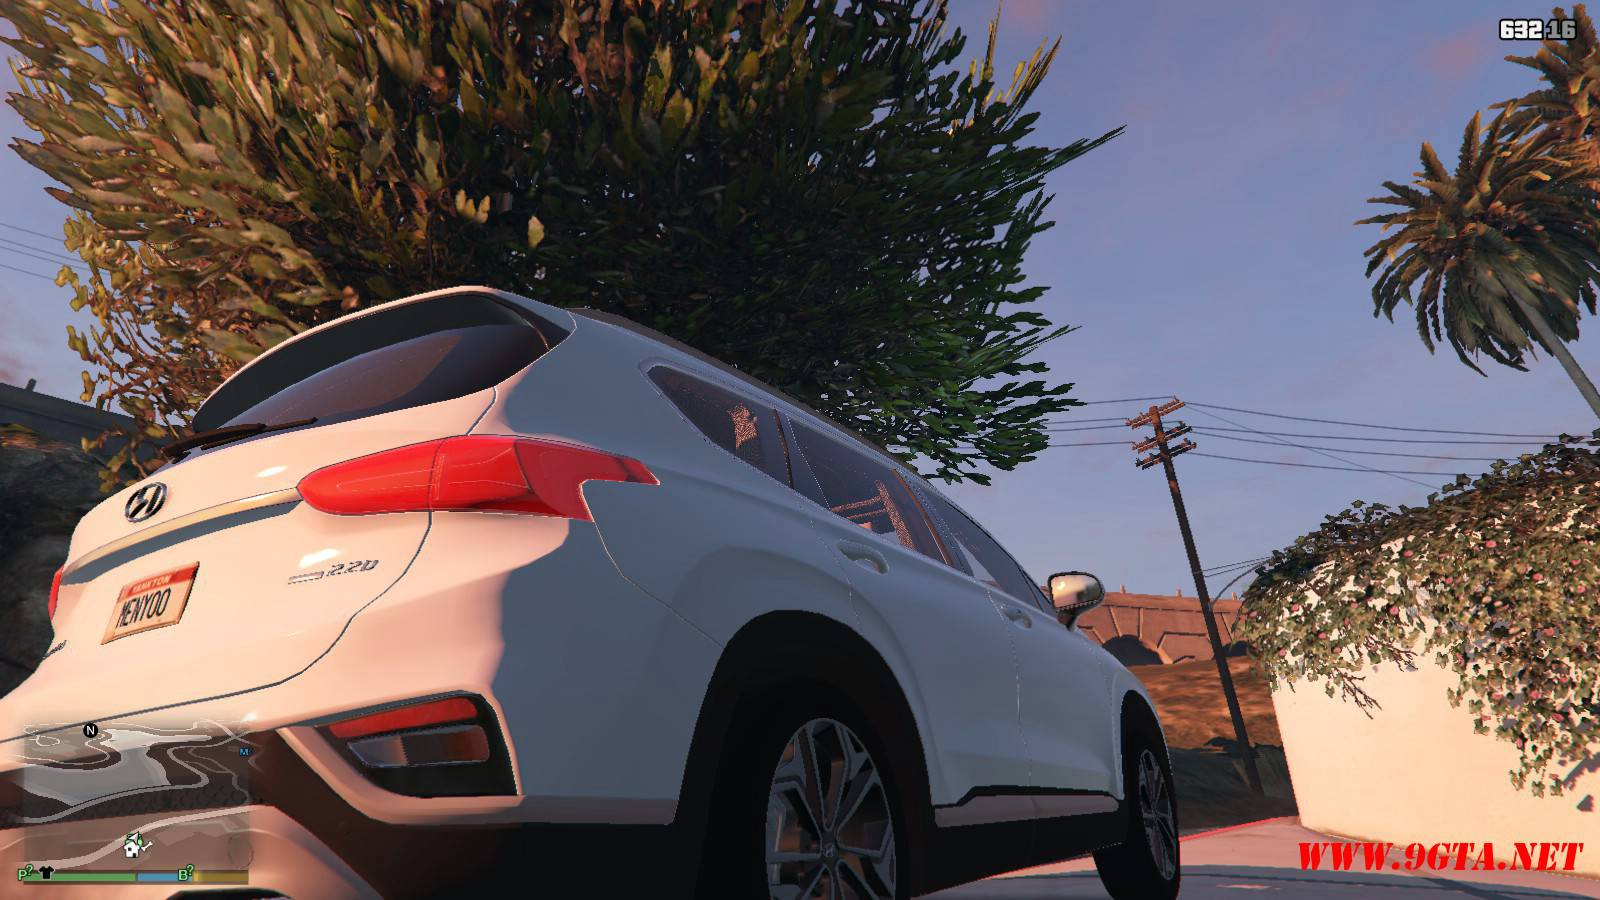 2019 Huyndai Santa Fe GTA5 mods (11)